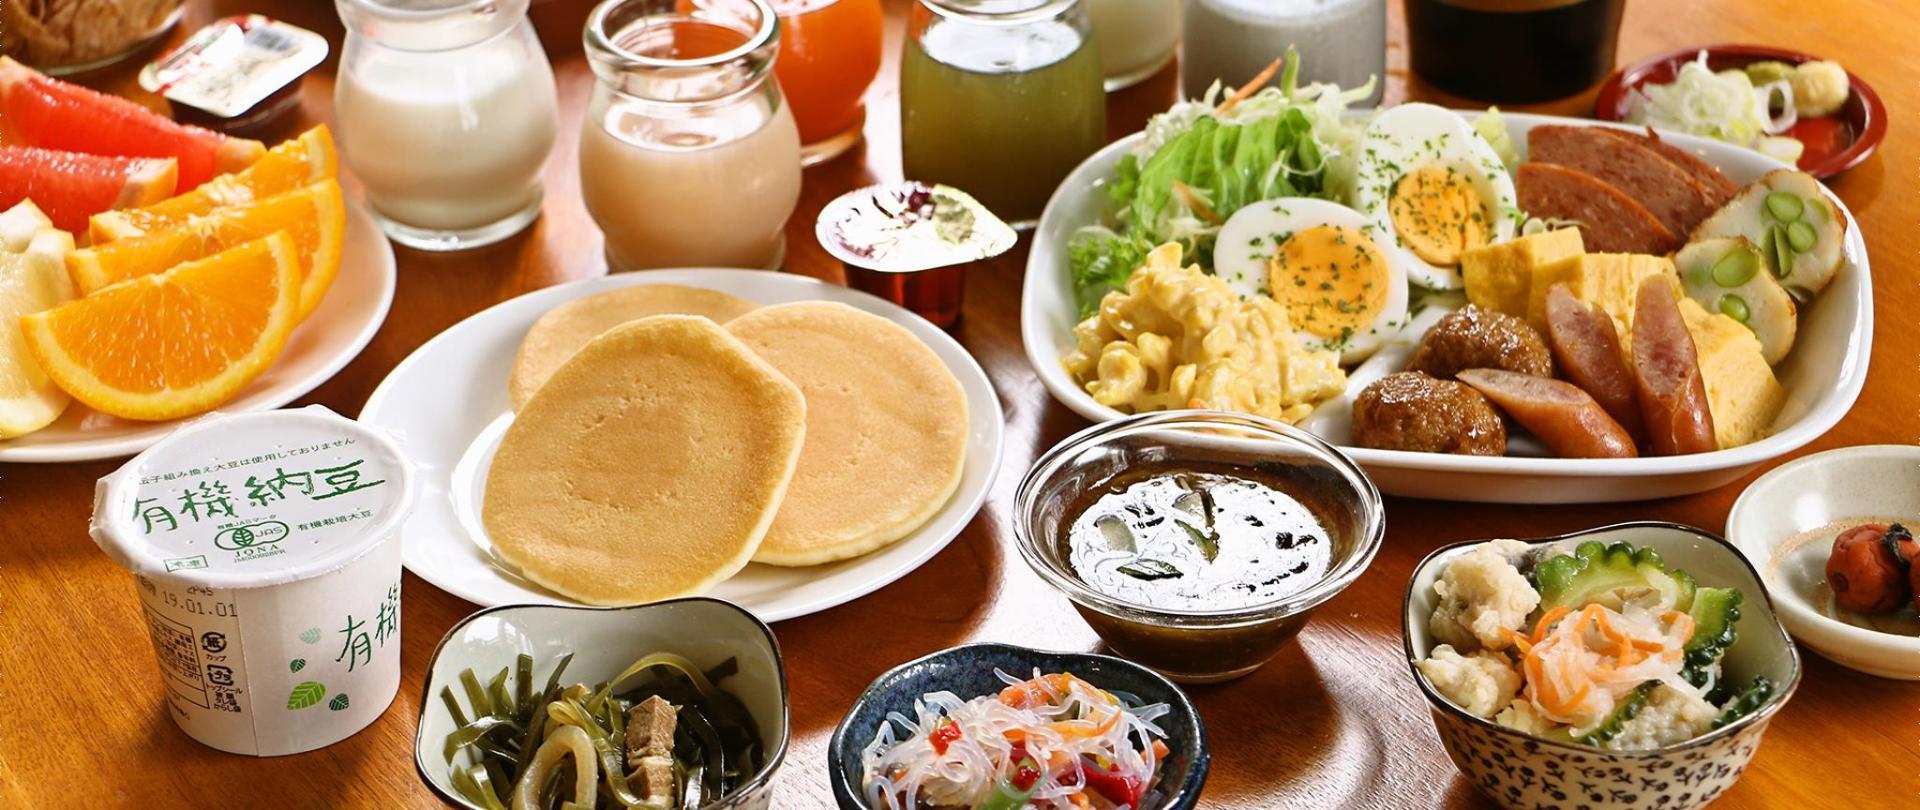 foodpic8575102.jpg